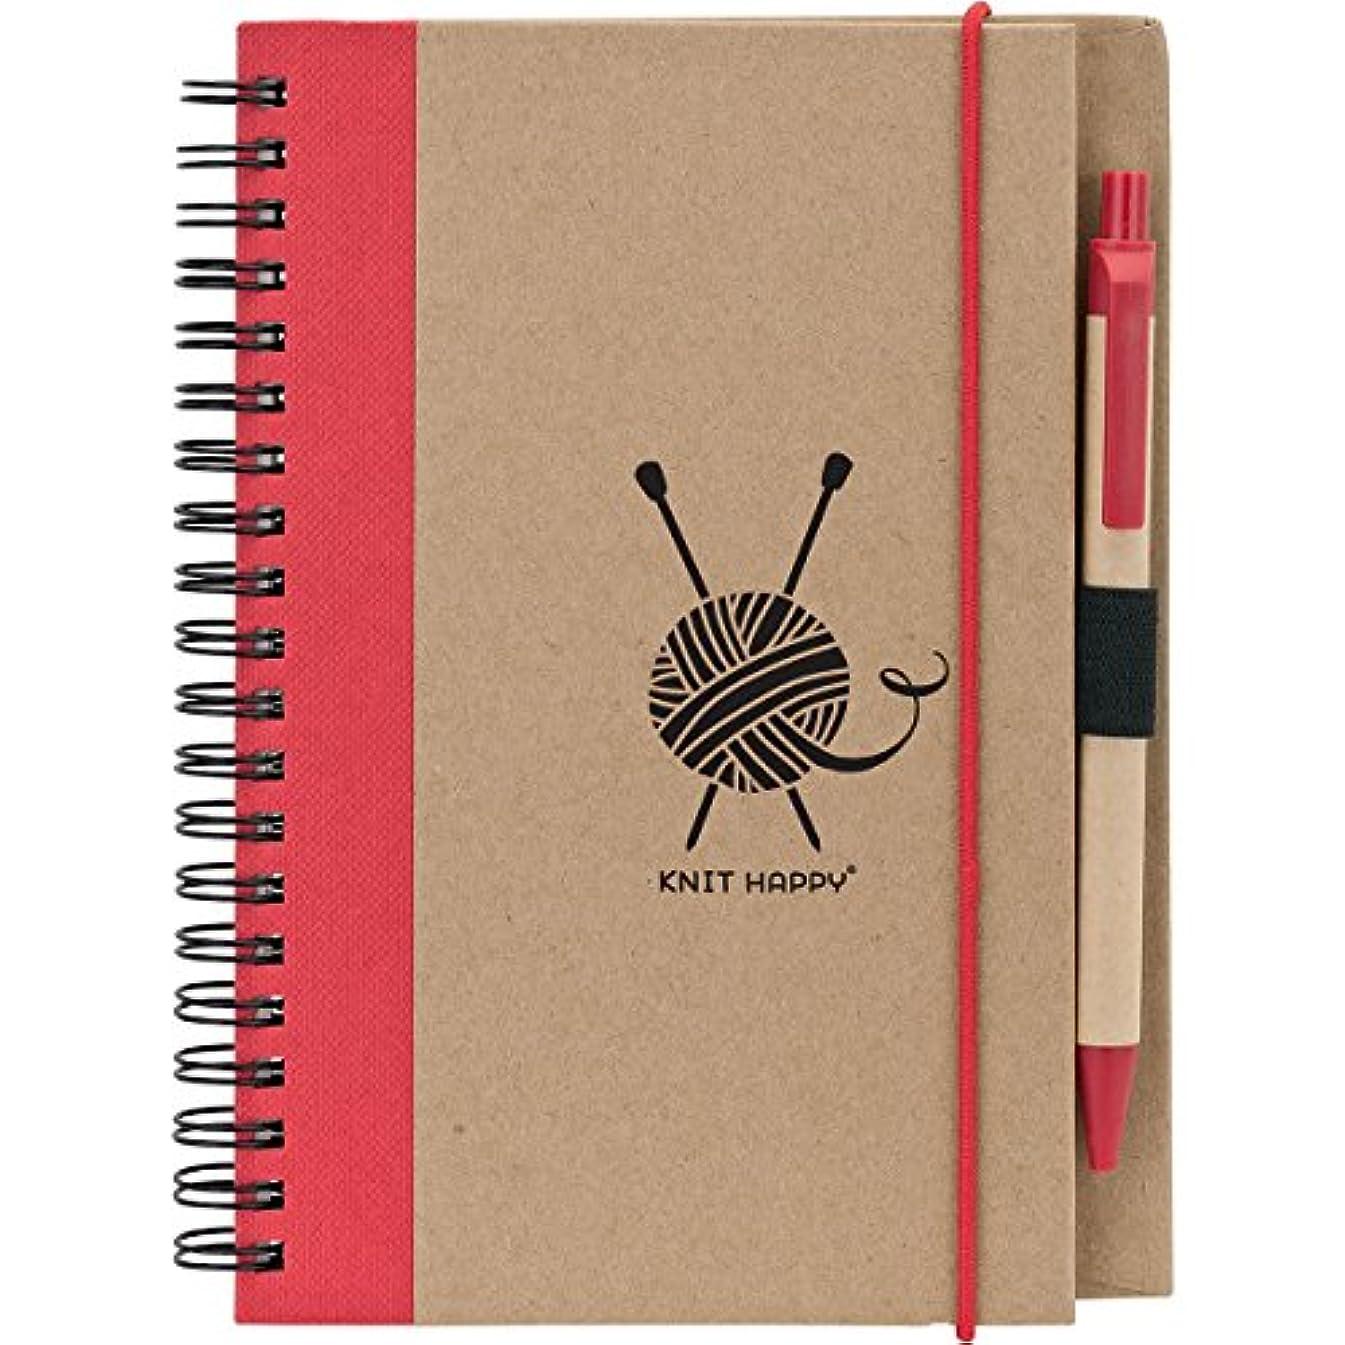 K1C2 KH302-RE Knit Happy Eco Journal W/Pen-Red